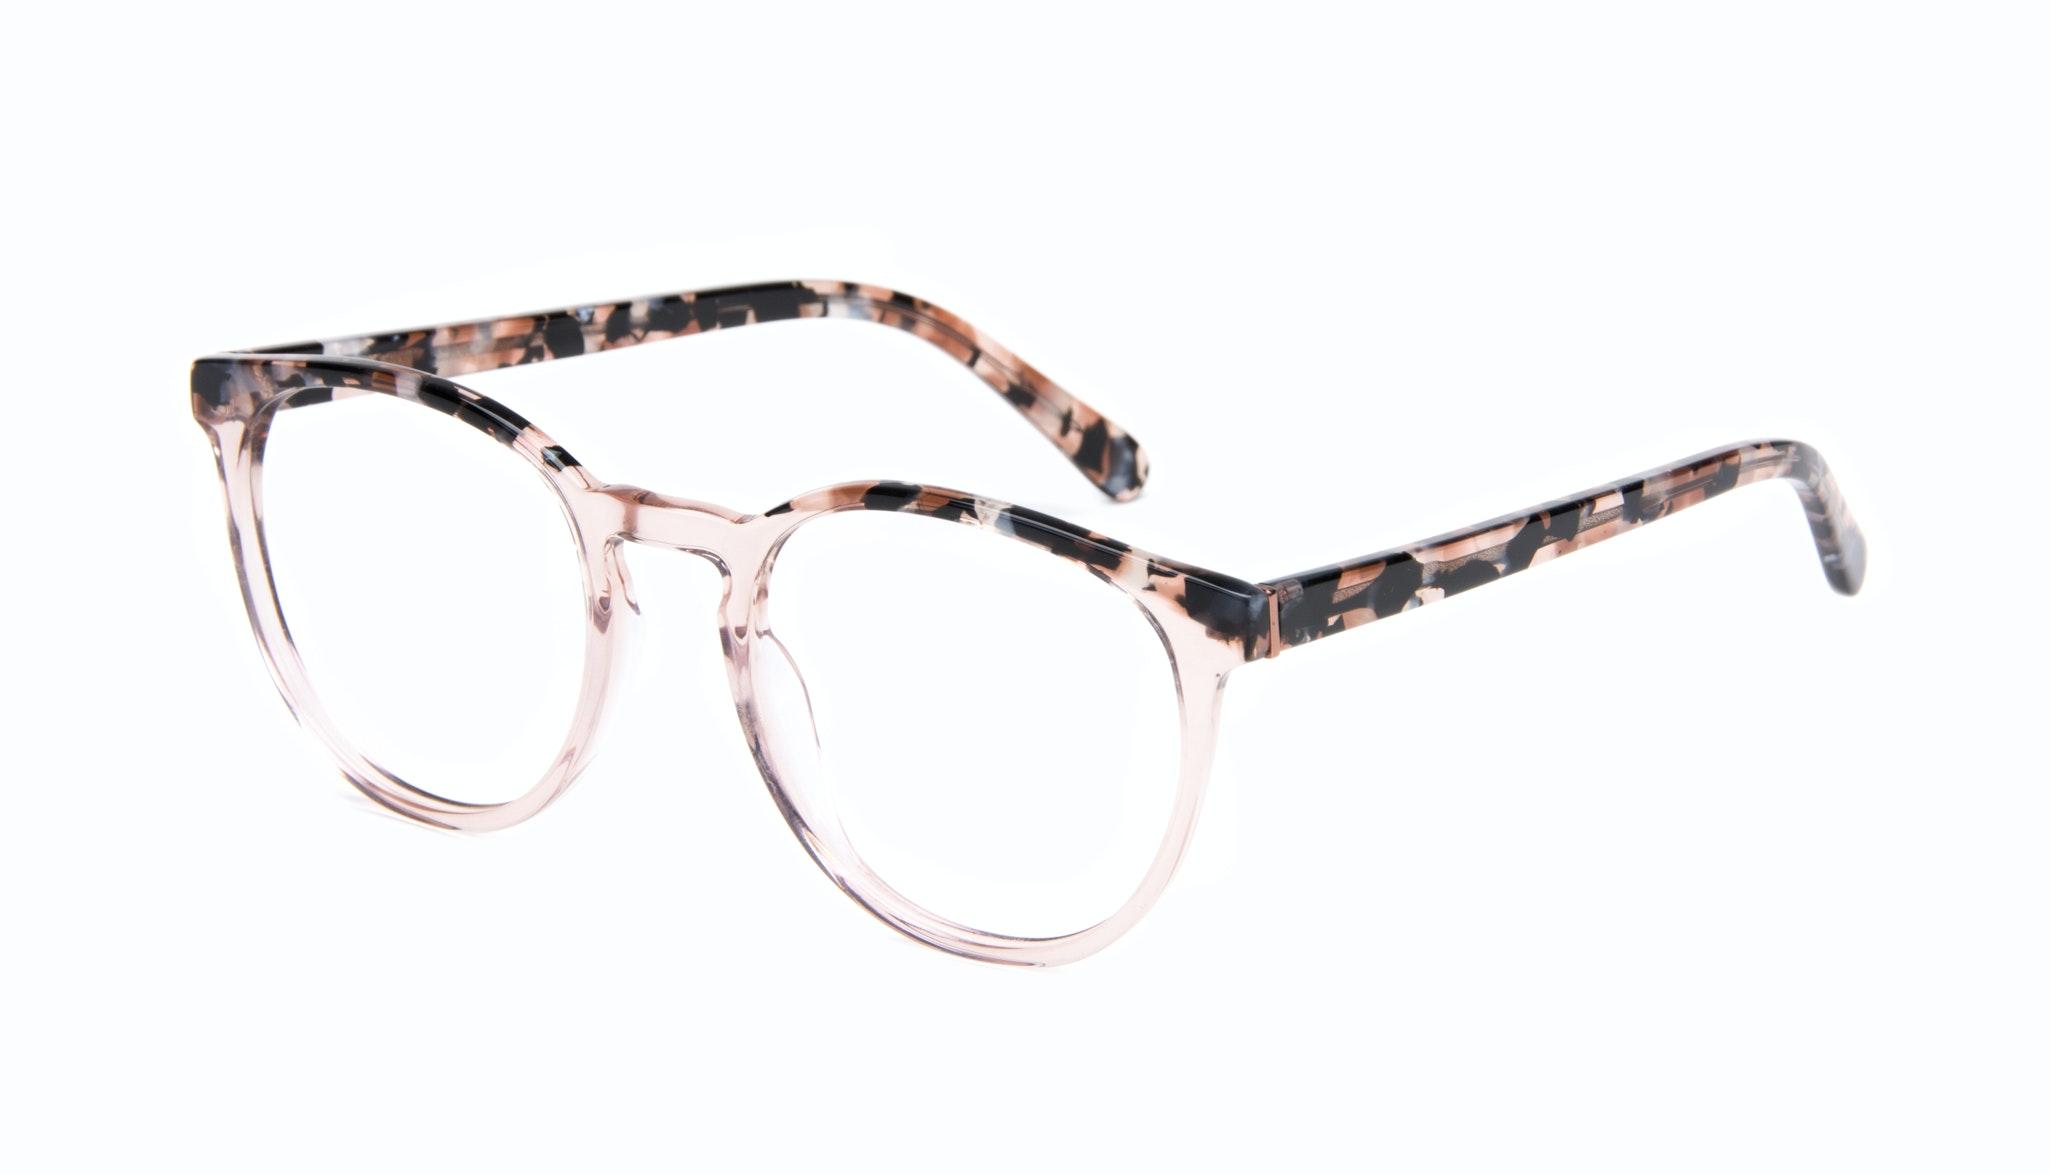 Affordable Fashion Glasses Round Eyeglasses Women Brilliant Rose Tort Tilt